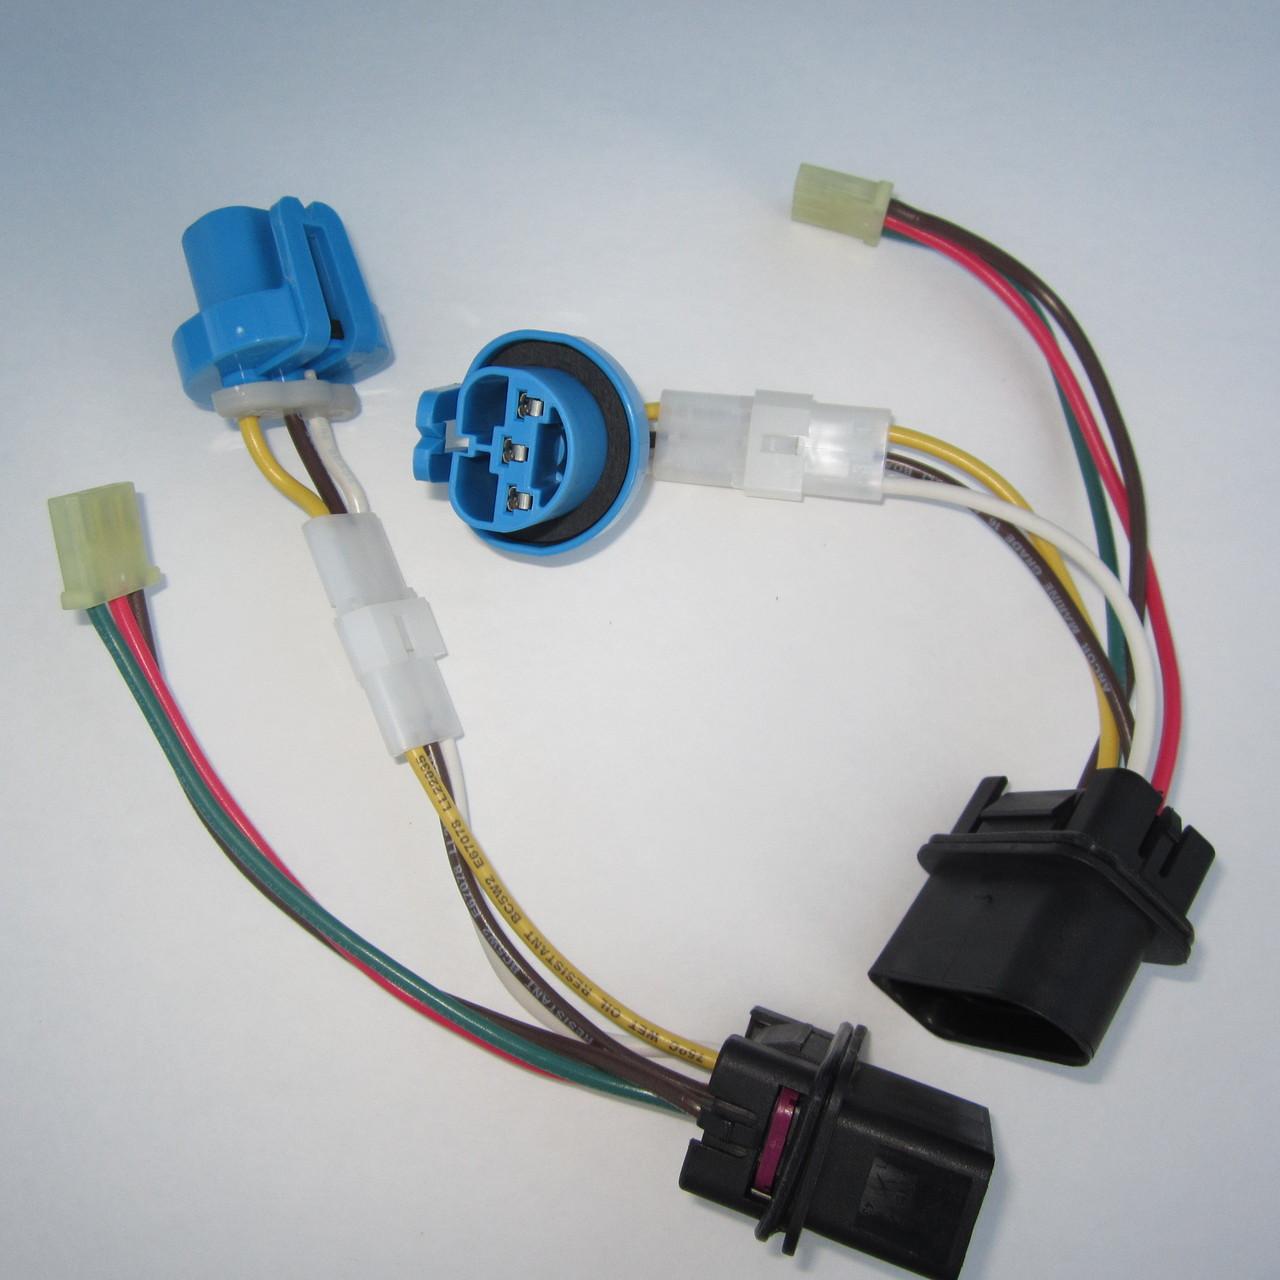 (2) Brand New, Complete Jetta Headlight Wiring Harness 1999 - 2005 VW MK4 Genuine OE Parts-4